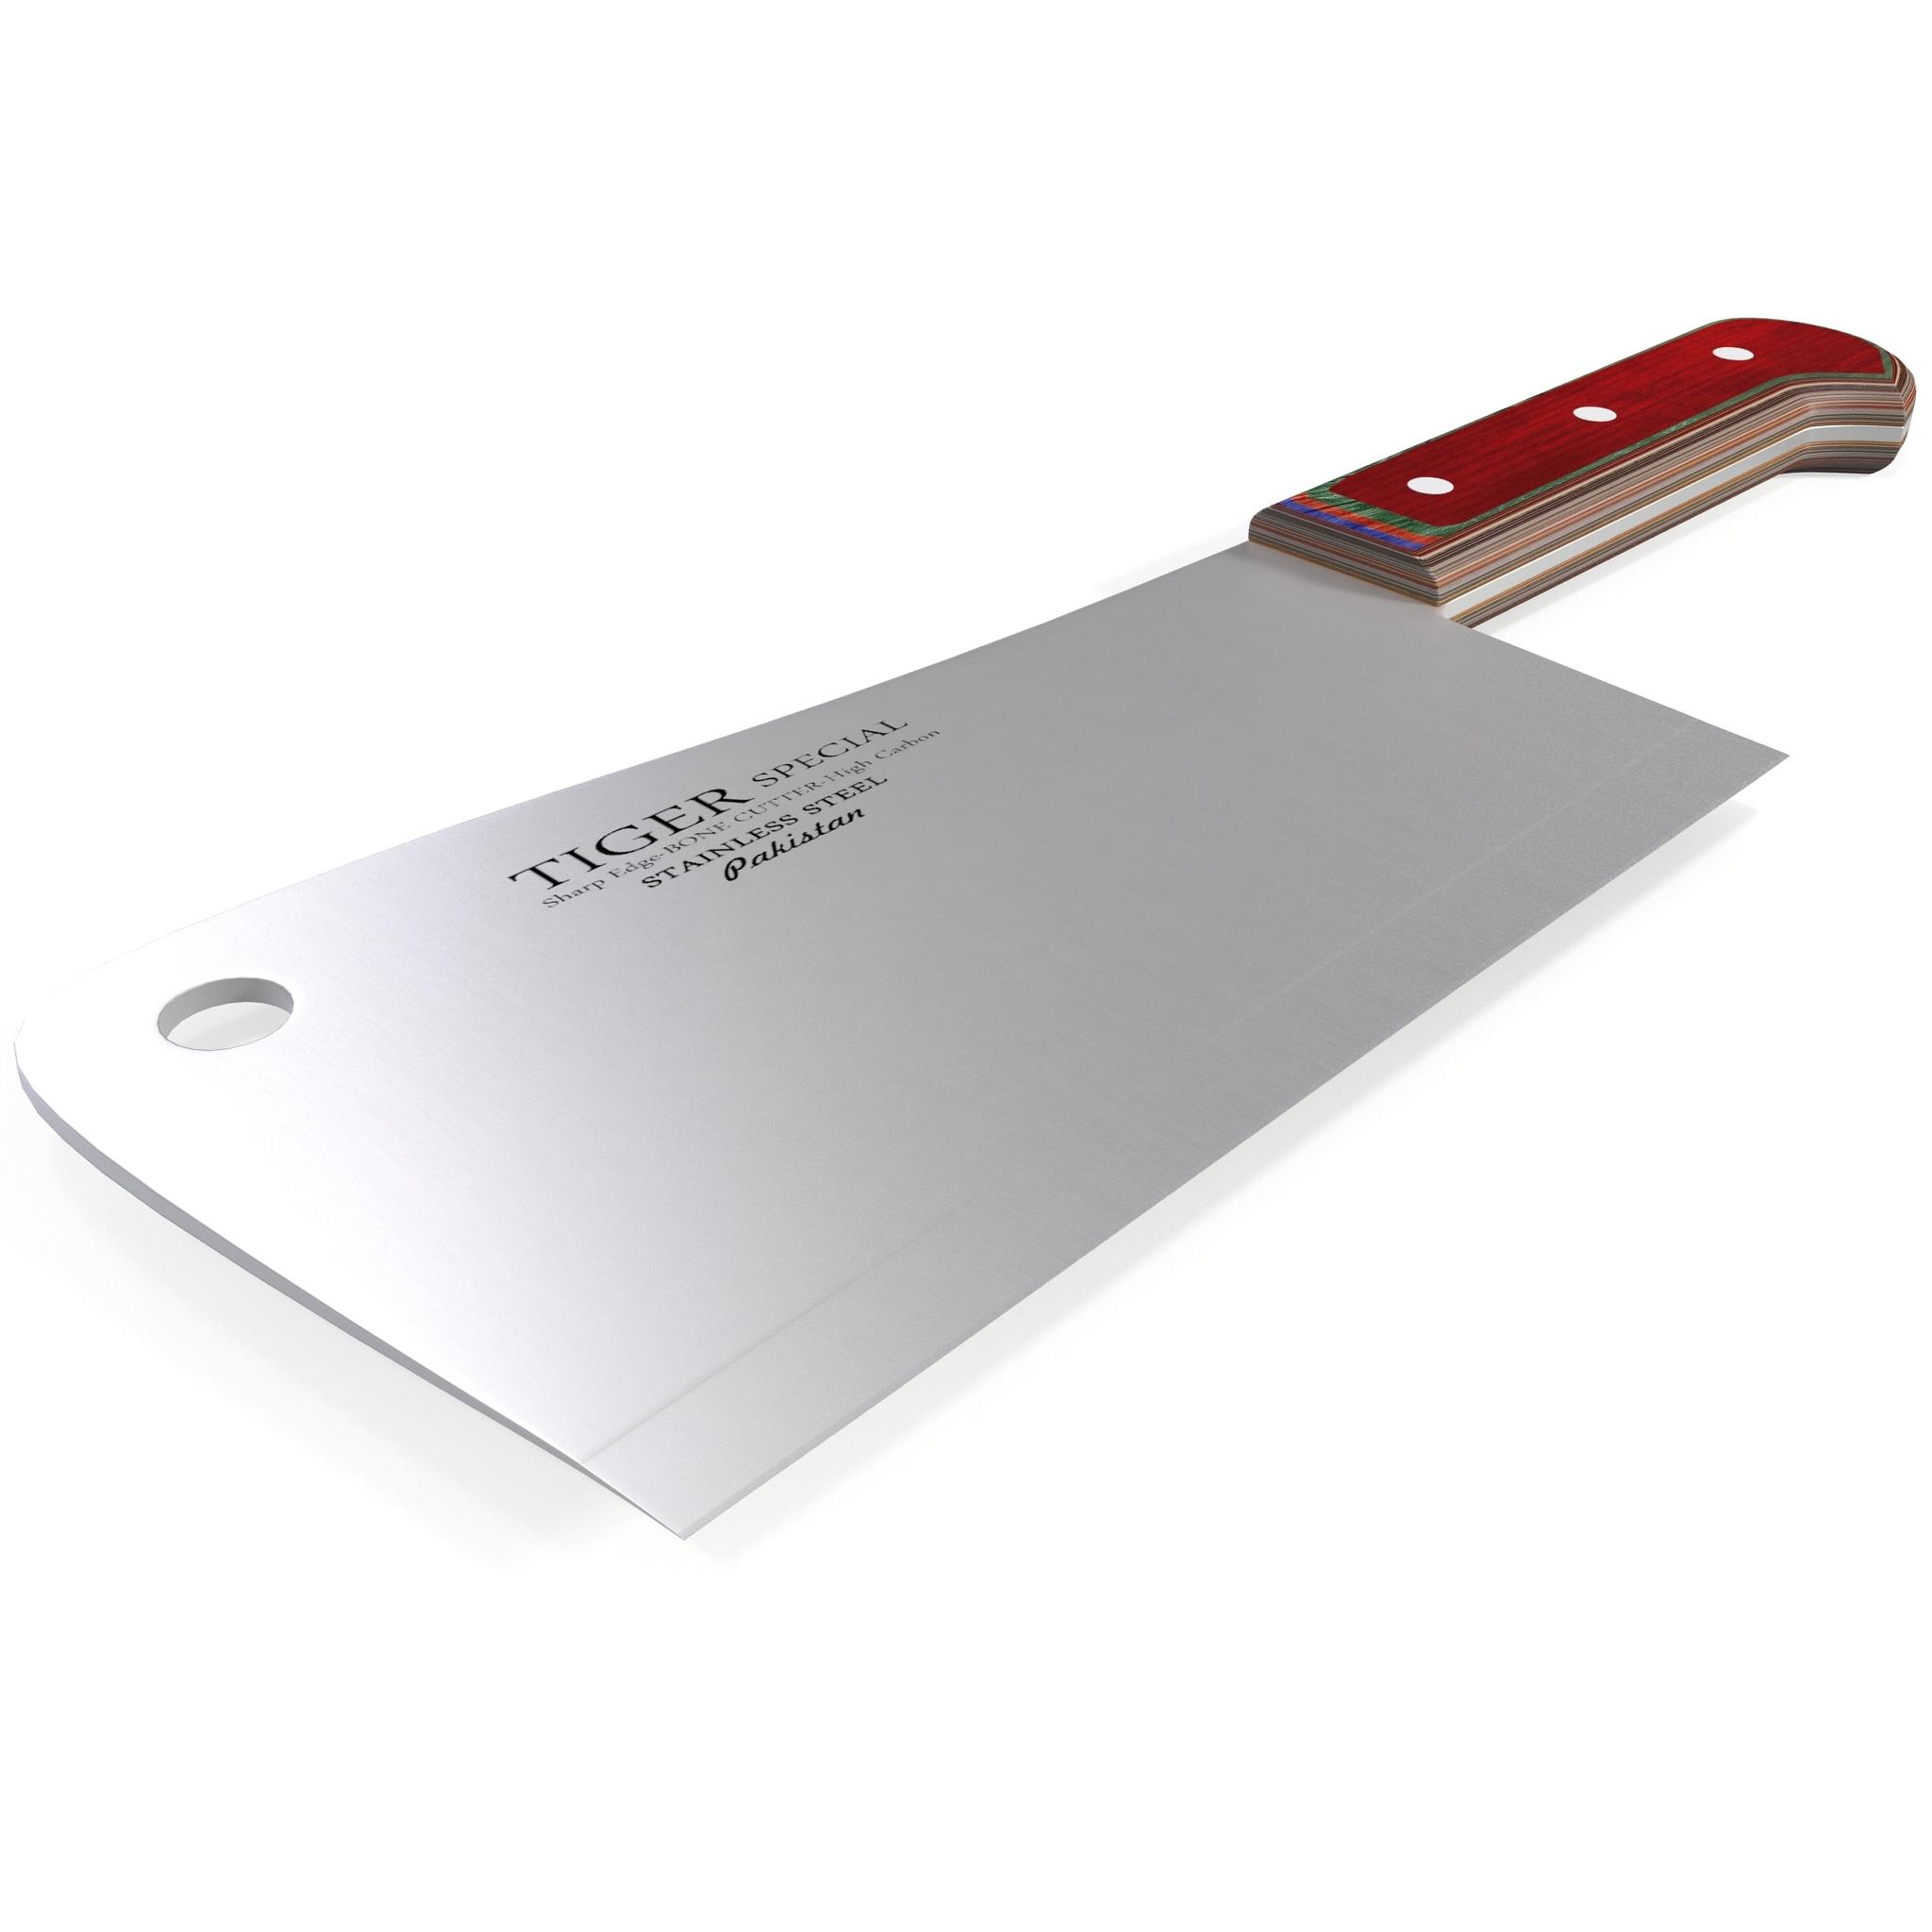 meat cleaver 3d model